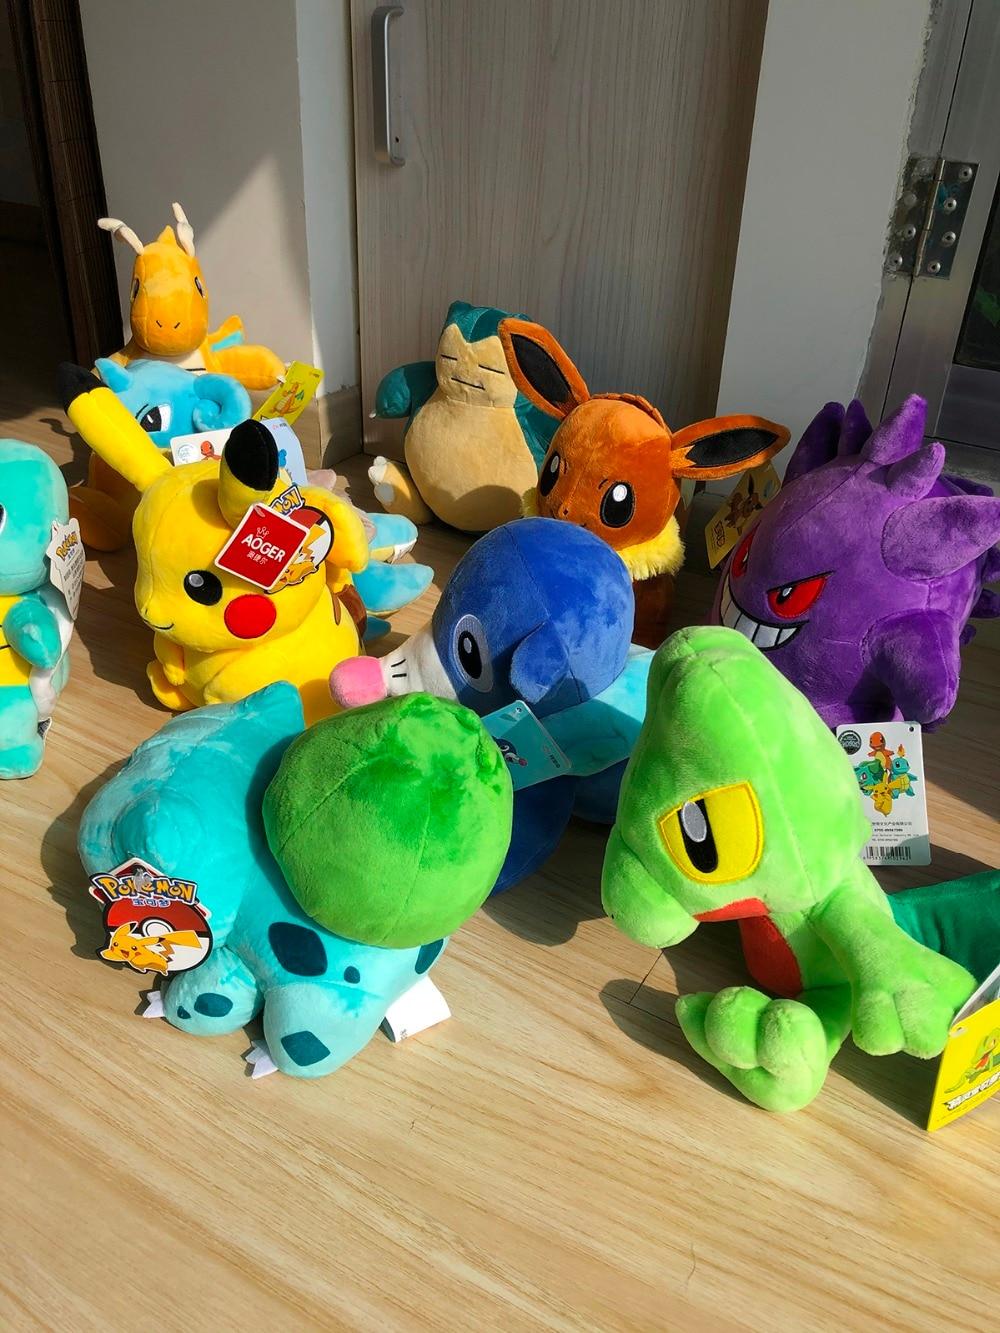 Pikachu Eevee Charmander Squirtle Bulbasaur anime stuffed plush doll Snorlax Mew Lapras Dragonite cute plush toy Kids gifts